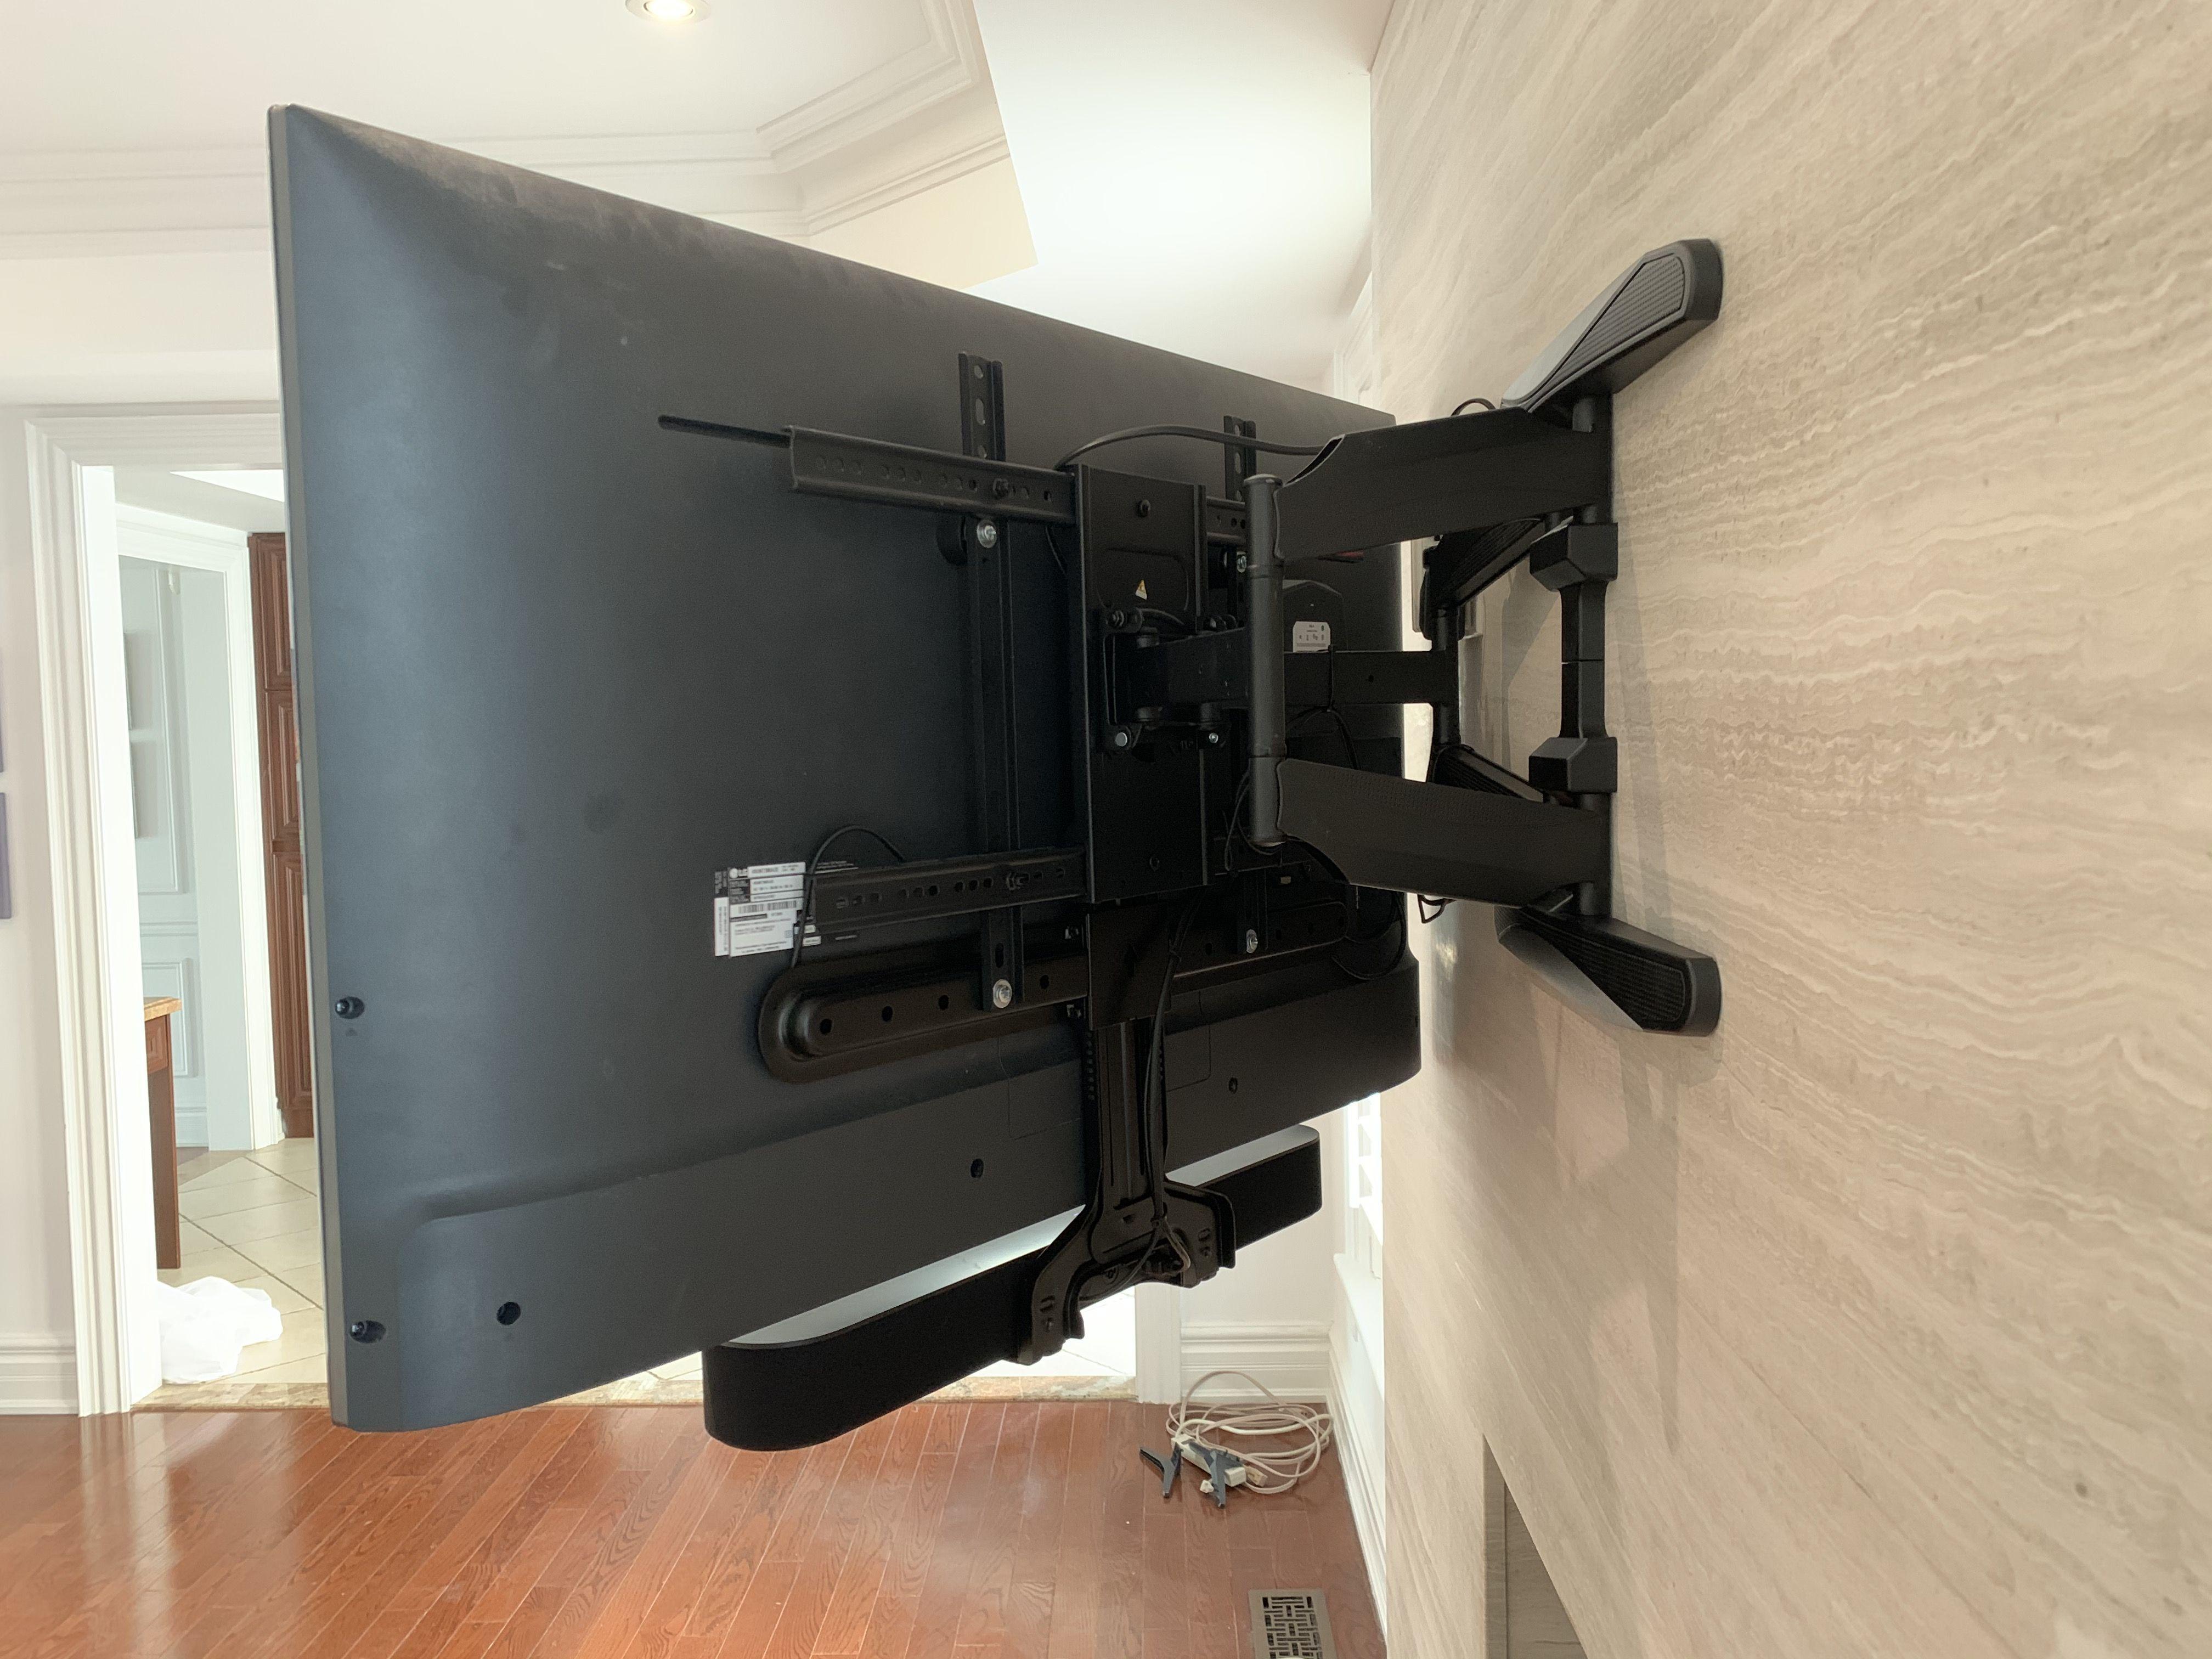 sonos beam mounted with sanus soundbar